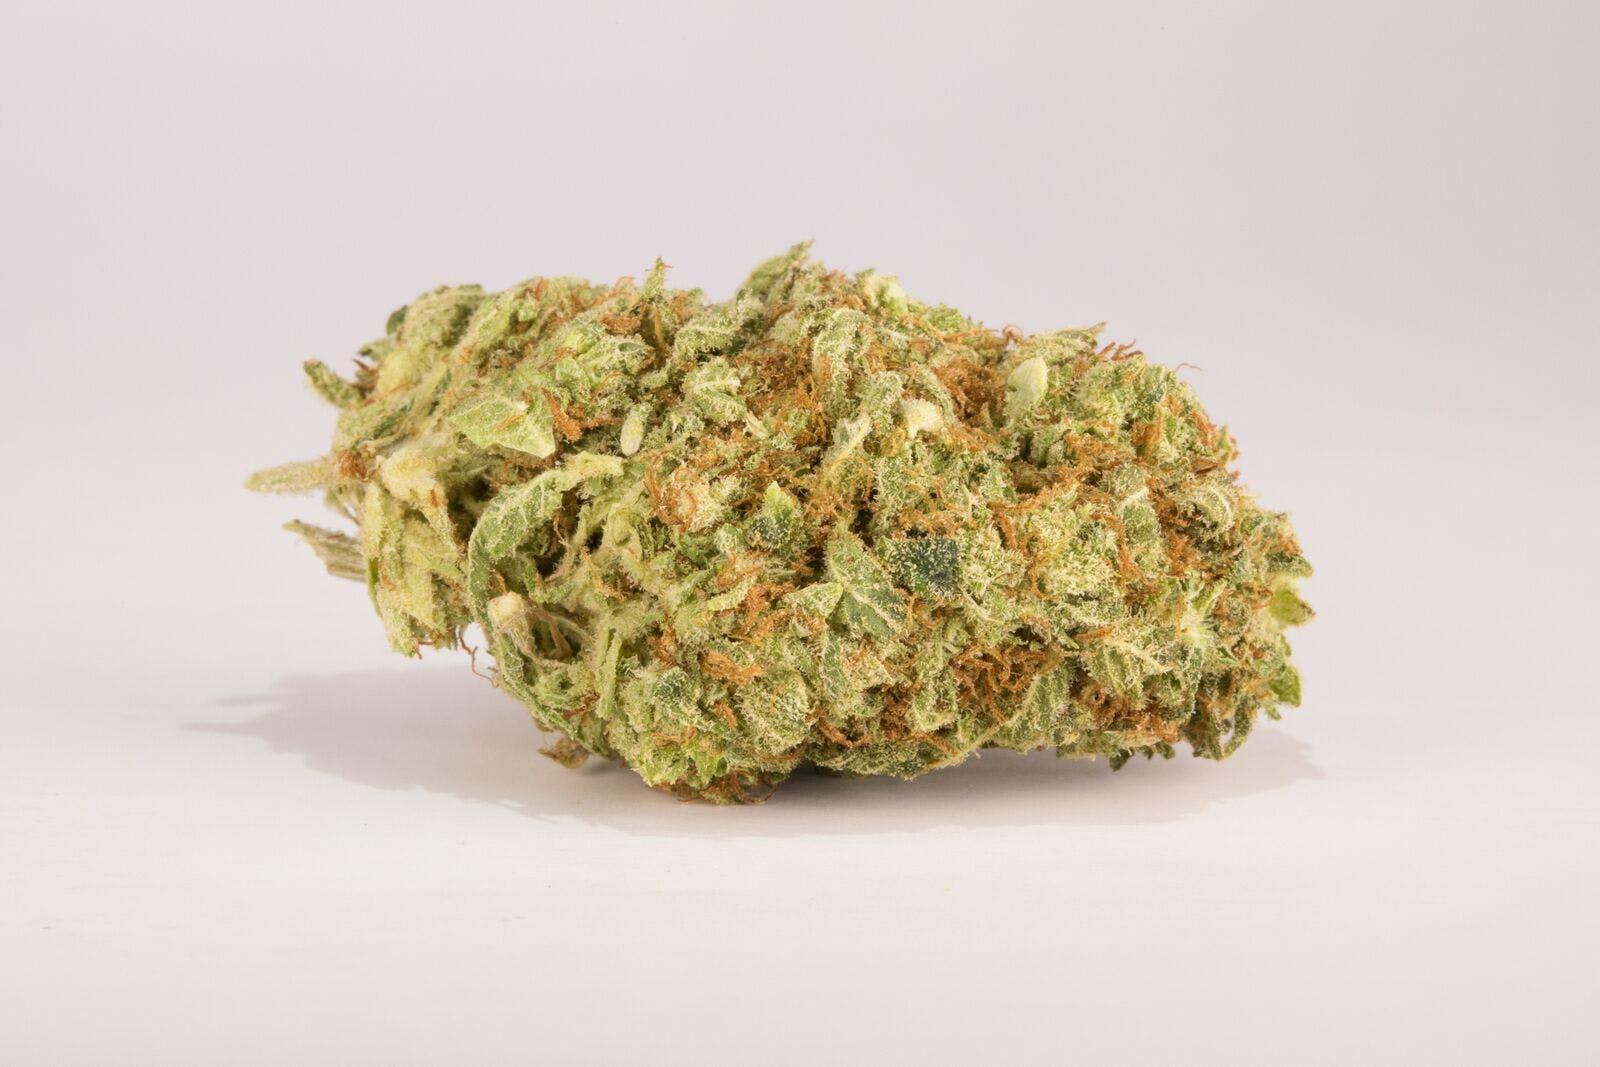 Sour Tangie Weed; Sour Tangie Cannabis Strain; Sour Tangie Sativa Marijuana Strain